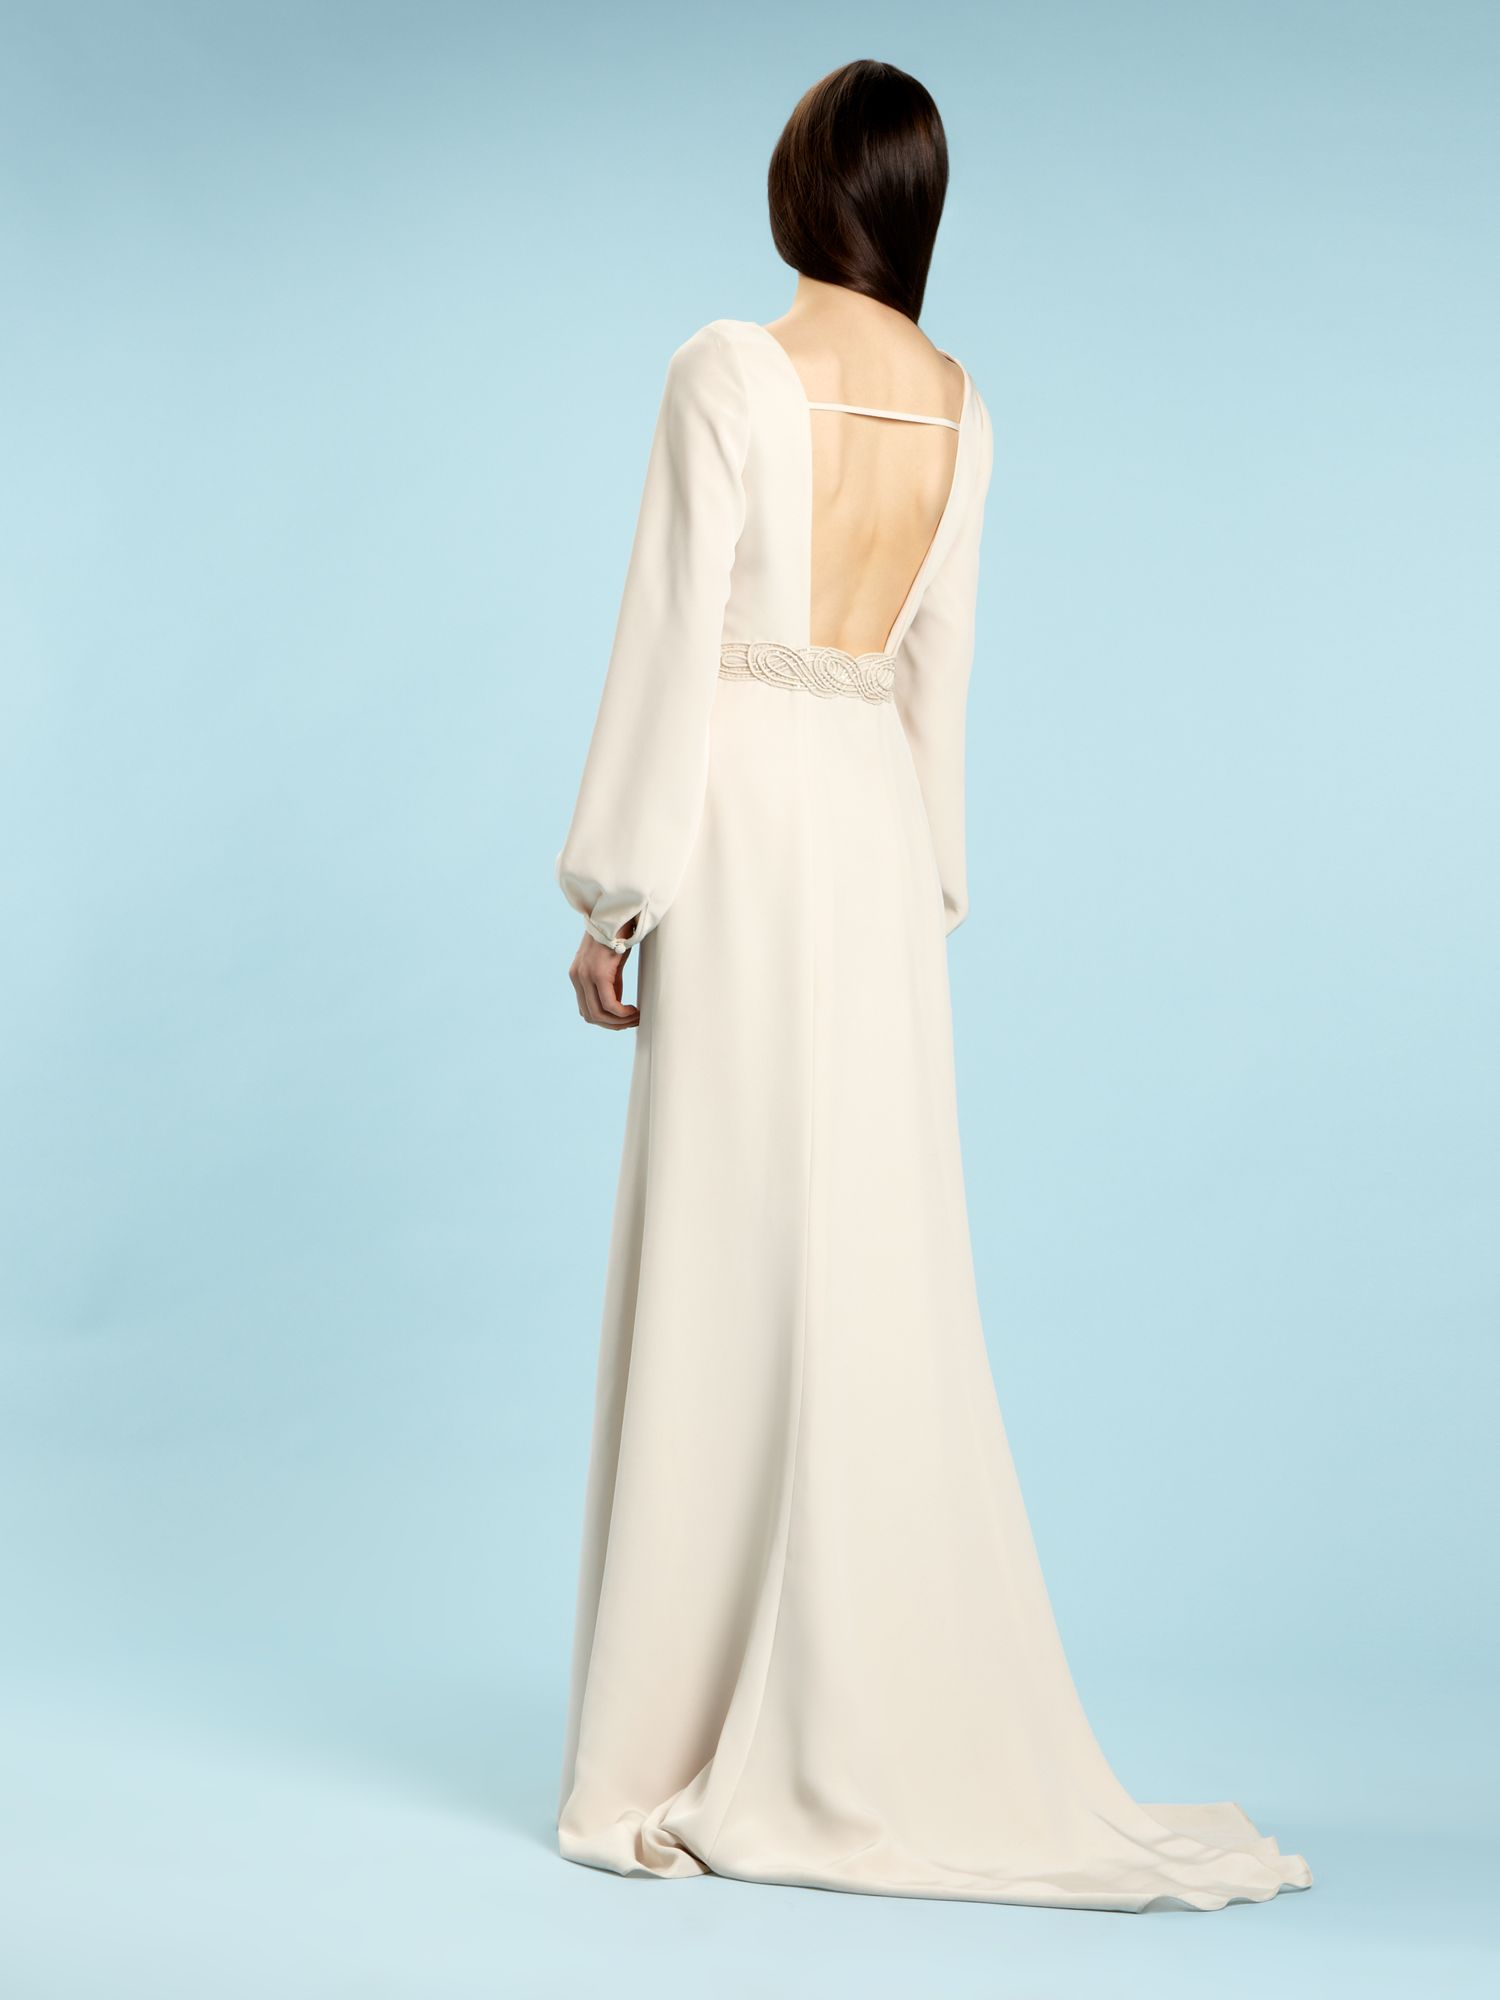 Lyst - Biba Alexa Bell Sleeve Bridal Gown in White